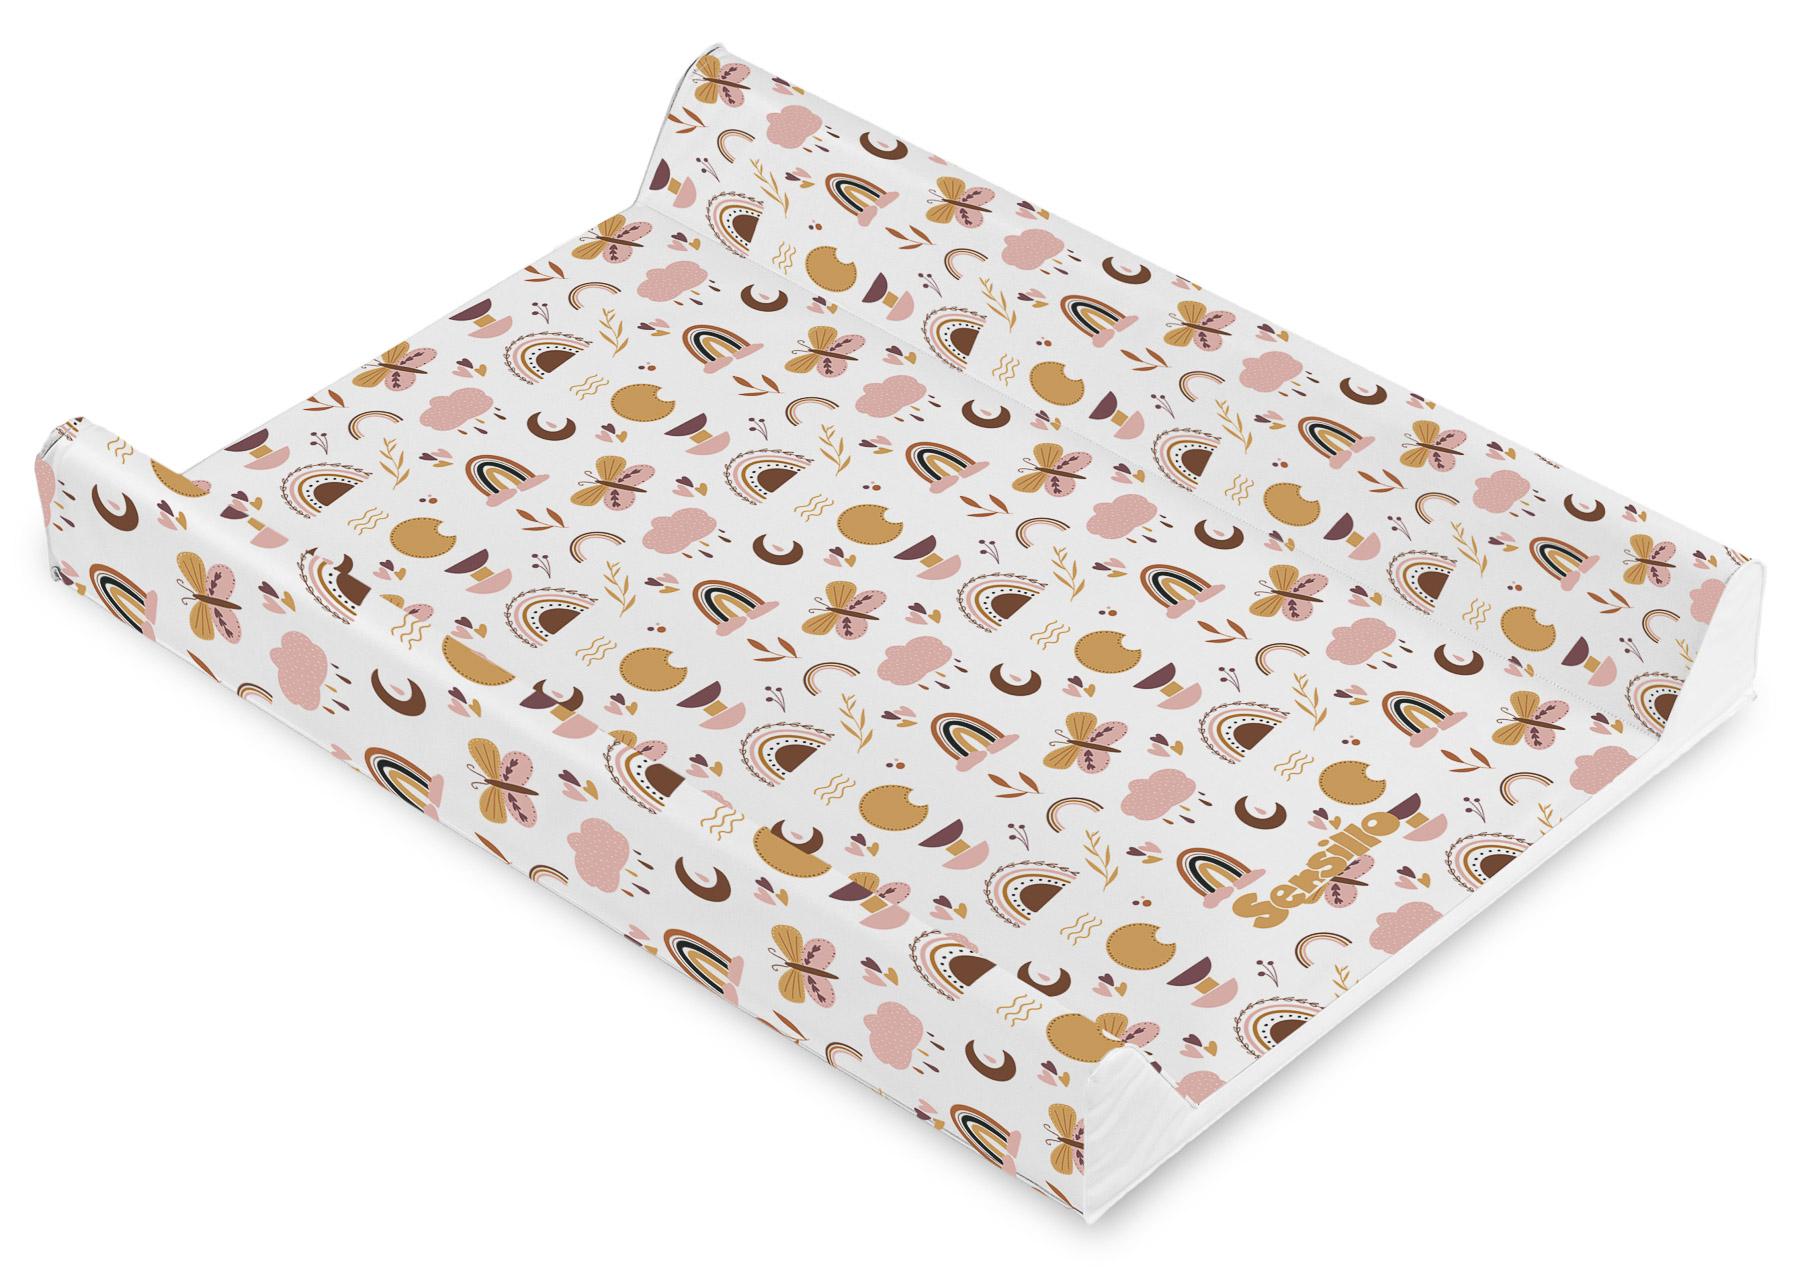 Soft changing pad – Boho